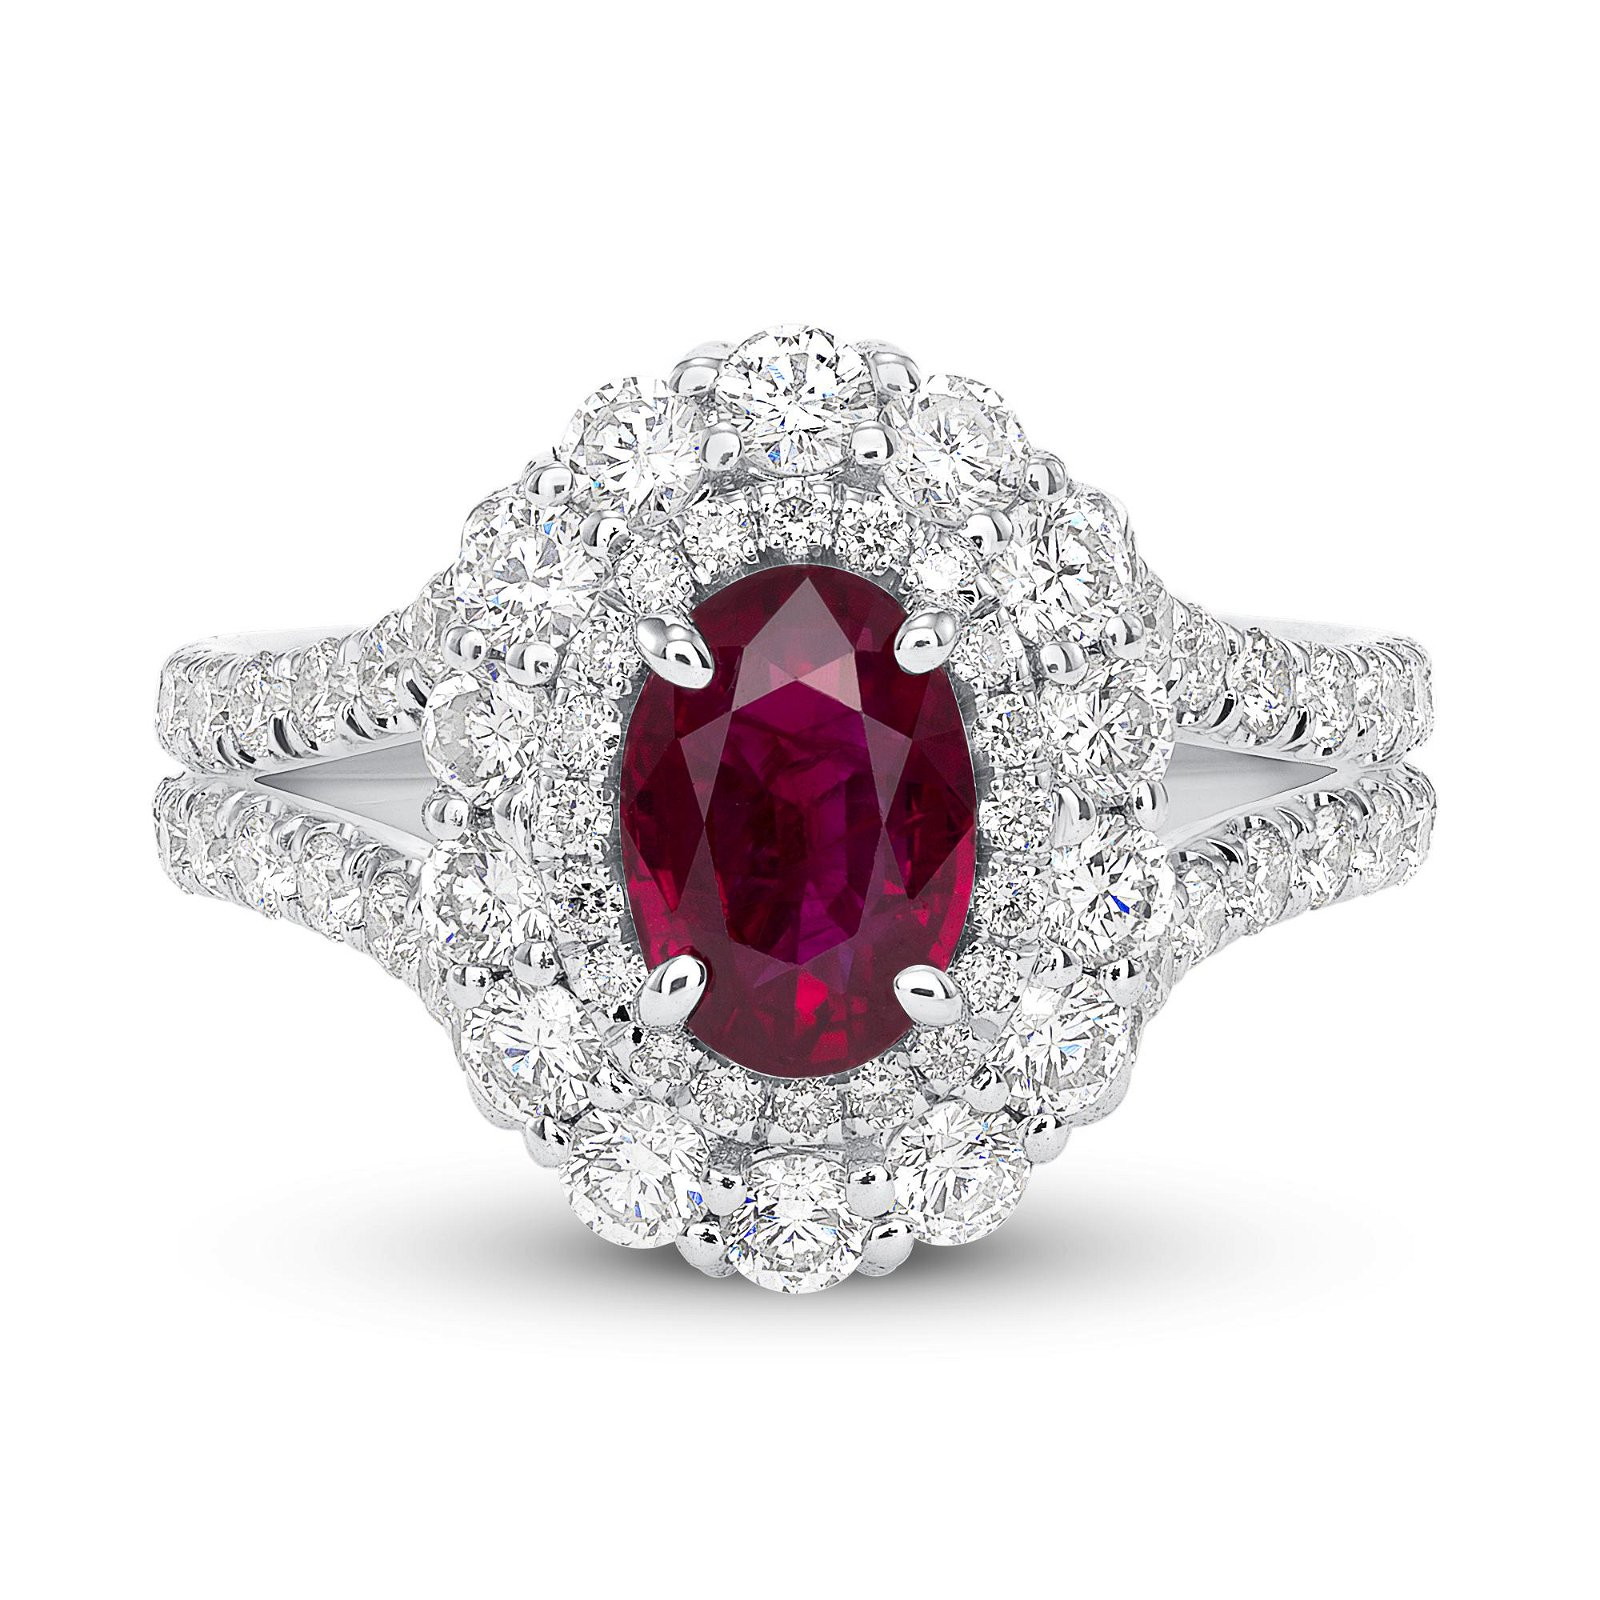 1.51ct Ruby 18K White Gold Ring